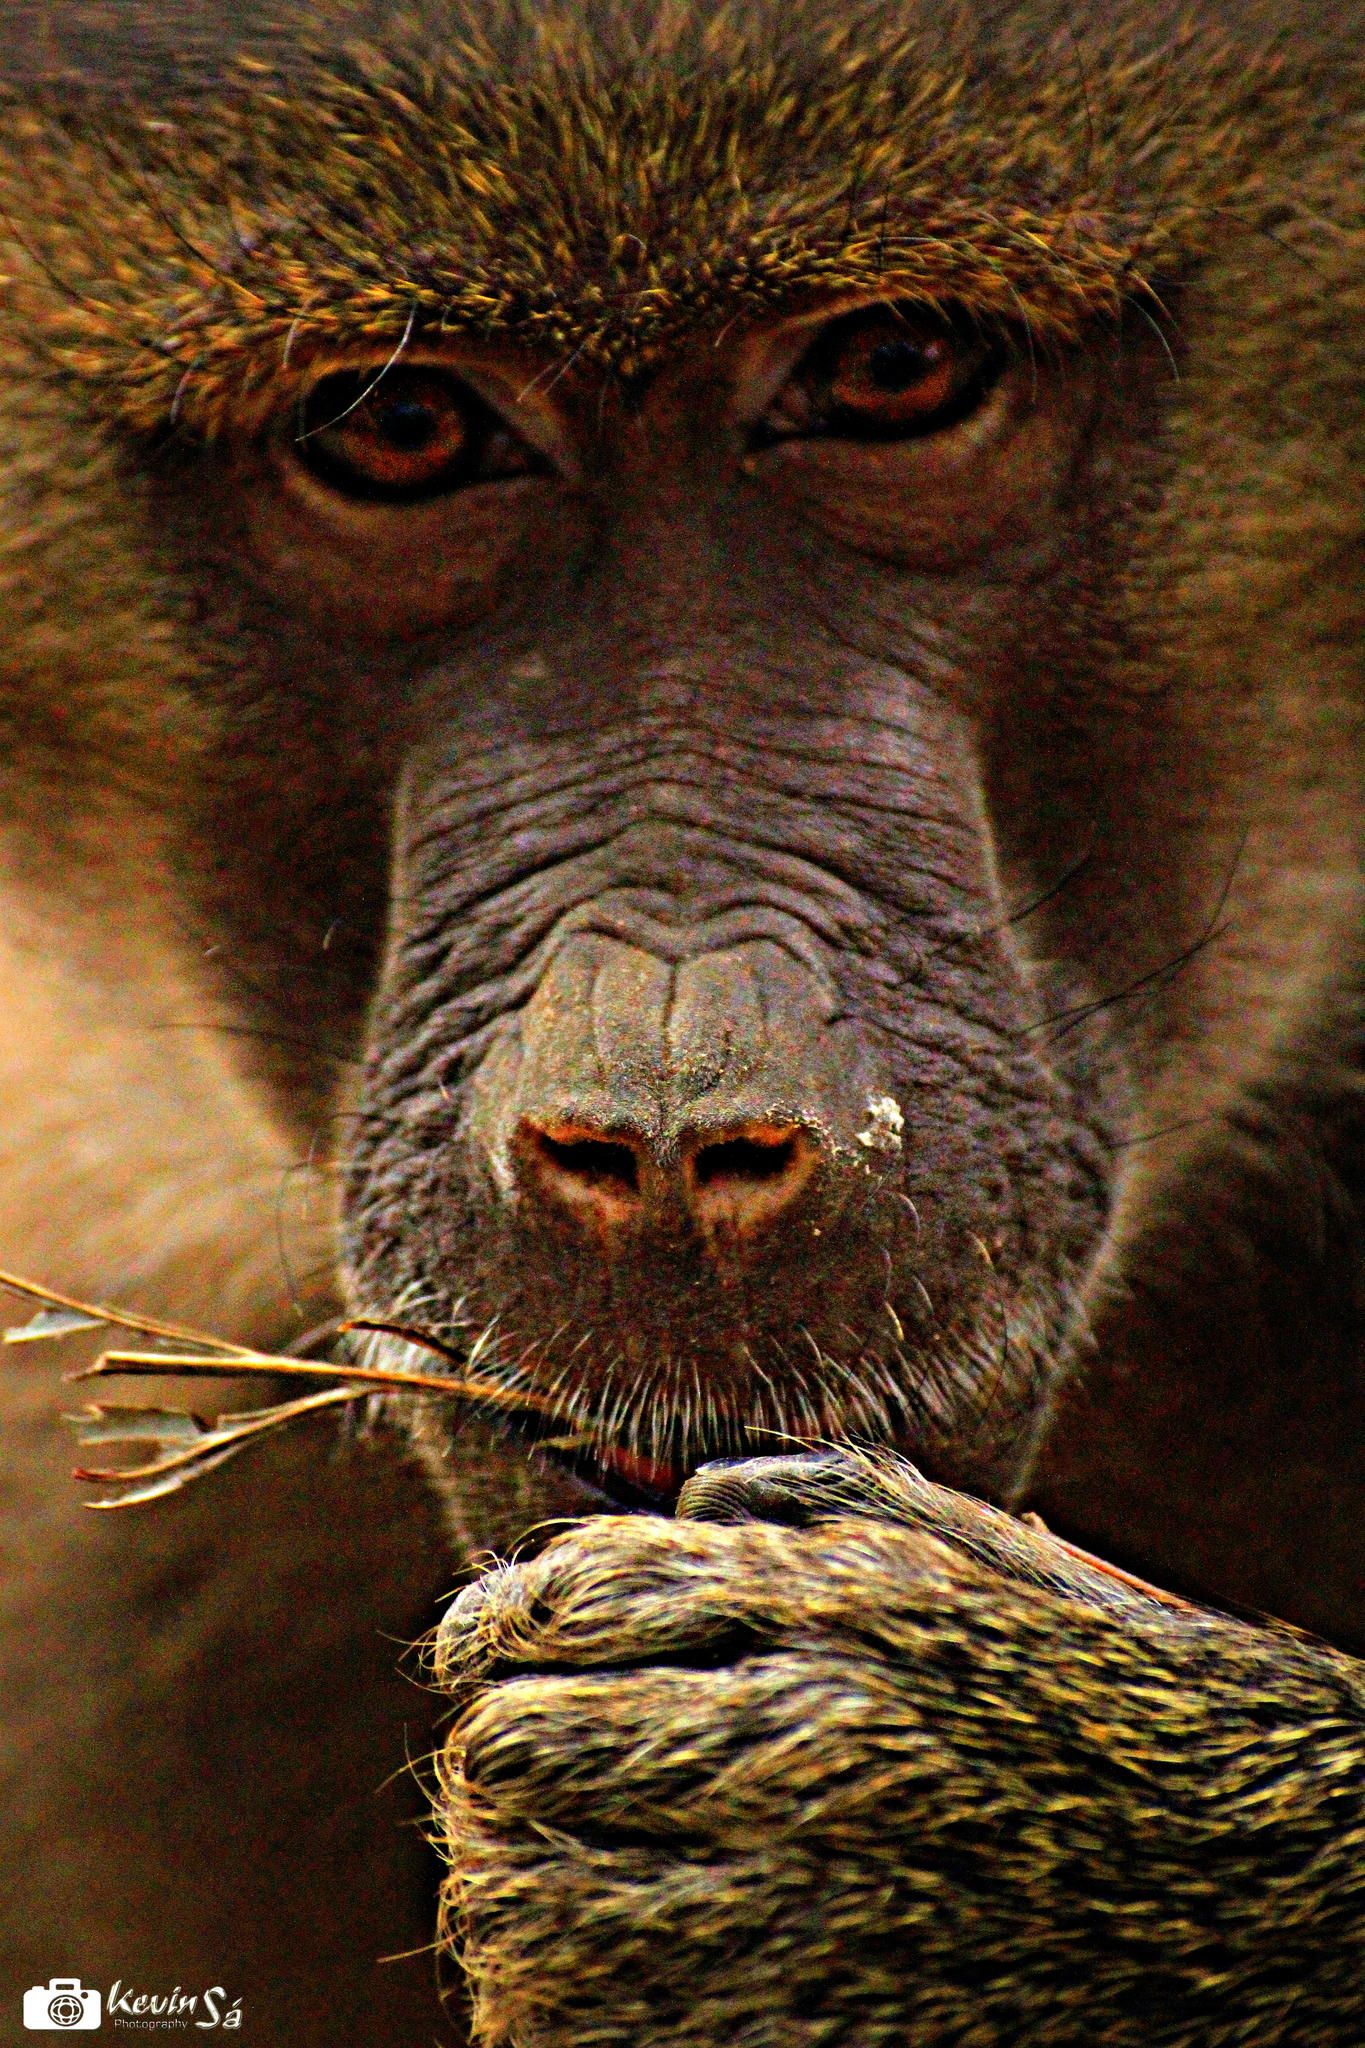 Monkey with a intelligent eye..